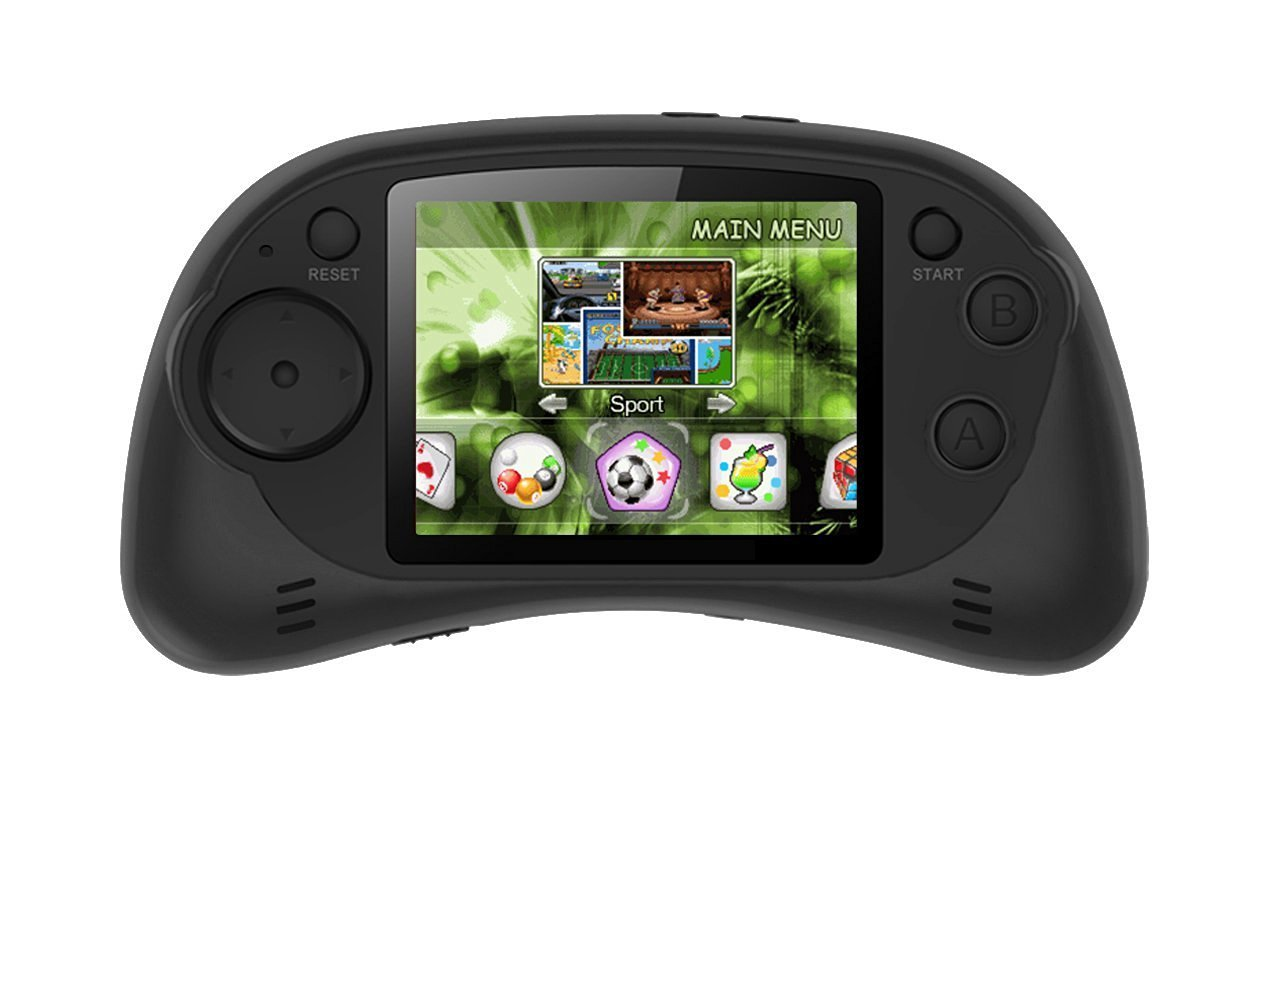 Handheld Portable Digital Preloaded Display Image 1